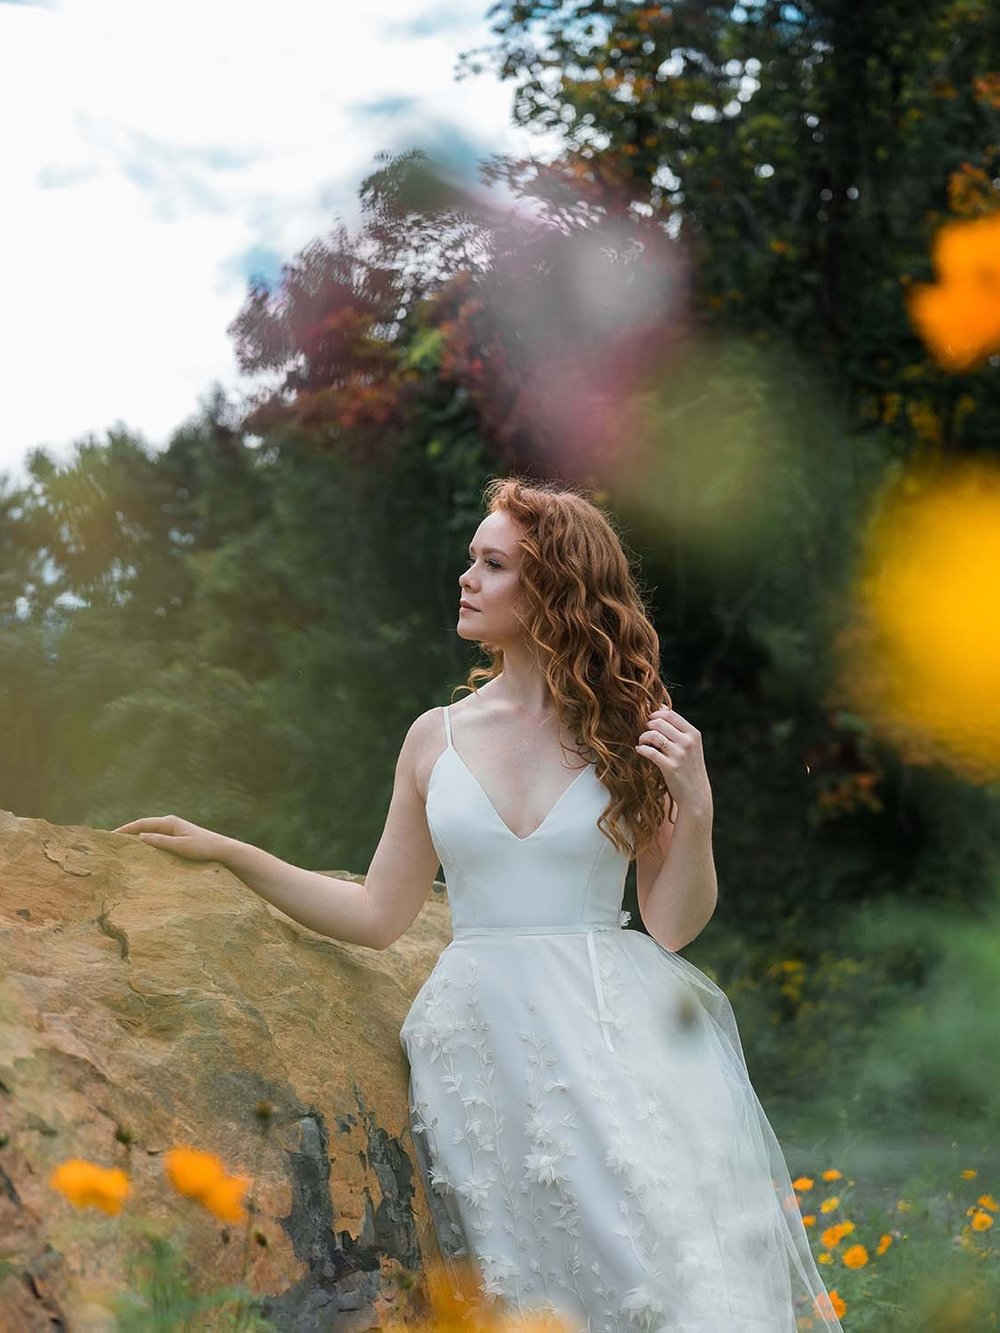 rebecca_schoneveld_reid_gown_romantic_boho_ivory_3.jpg